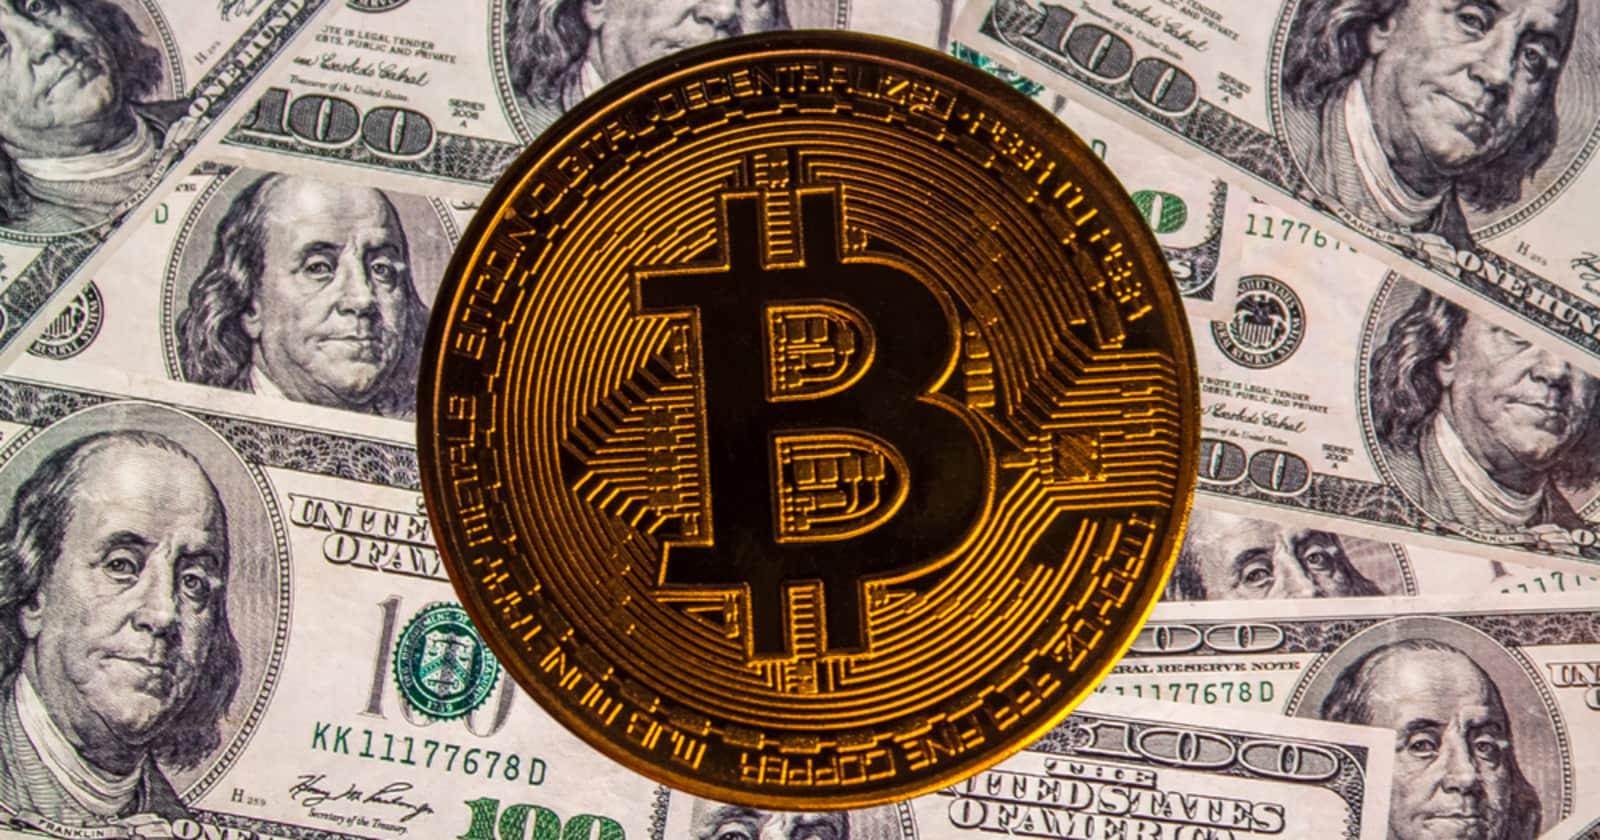 Bitcoin Price to Surge as US Dollar Slumps